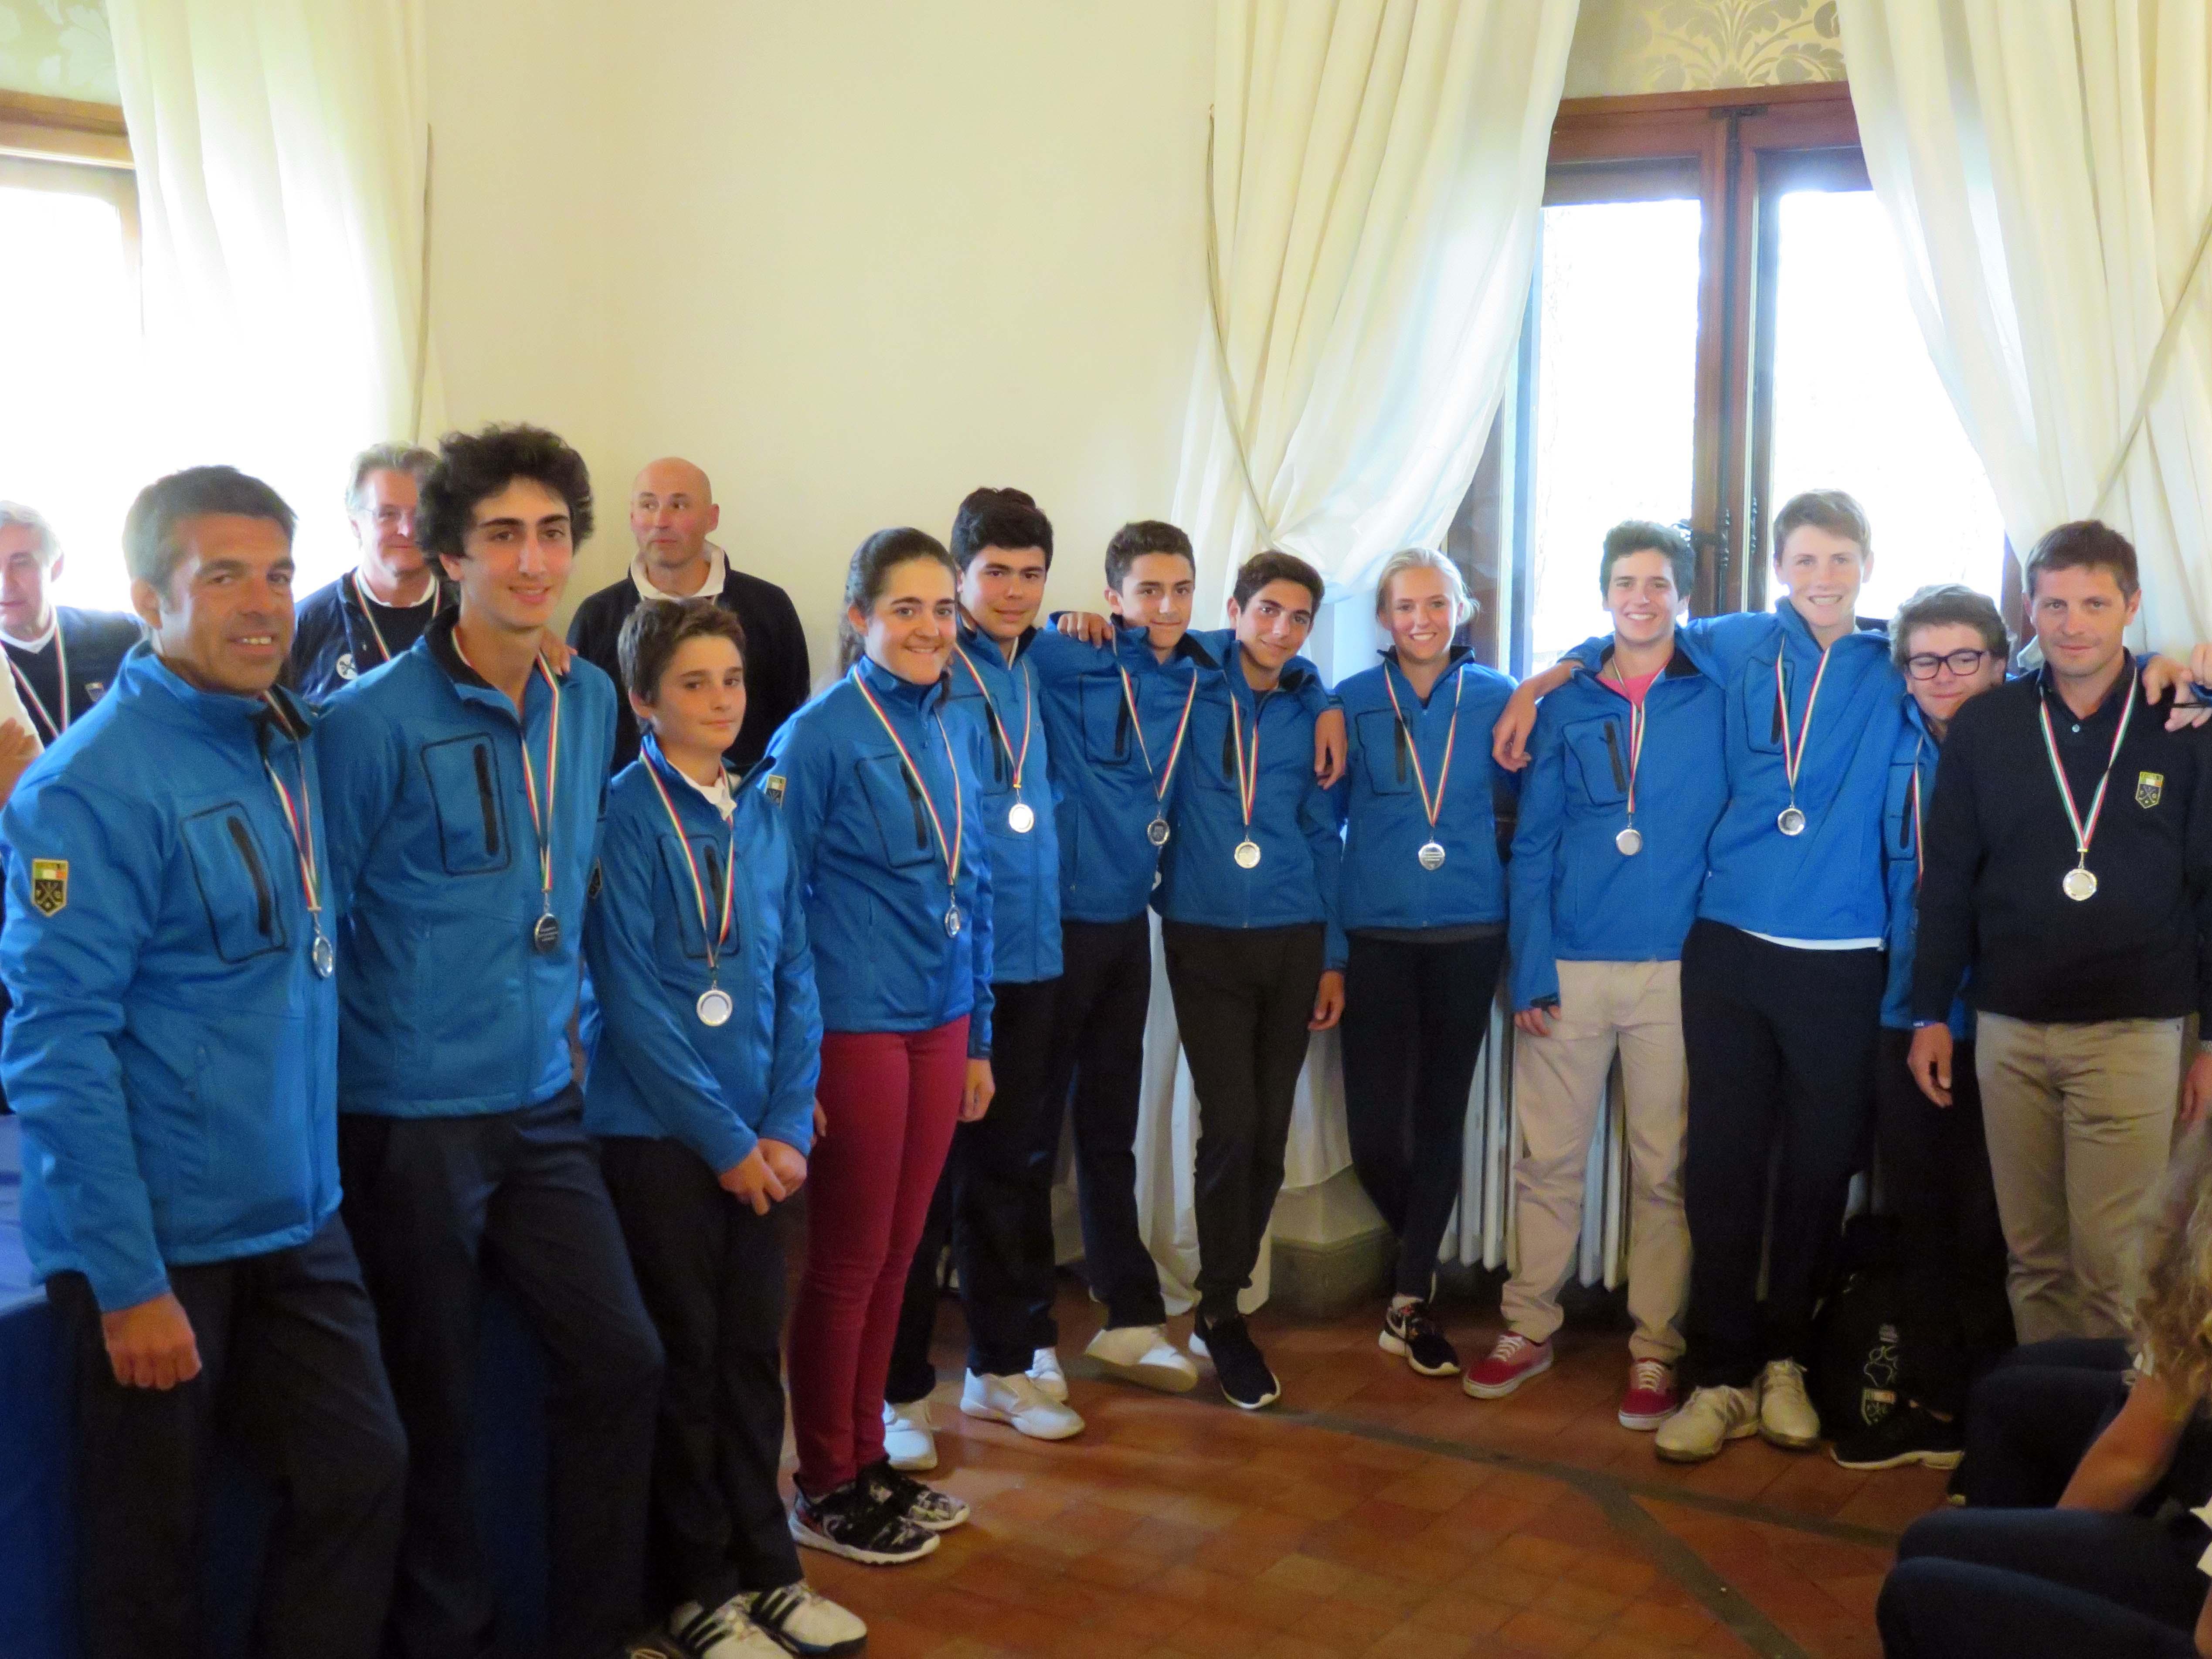 squadra piemonte bordoni 2015